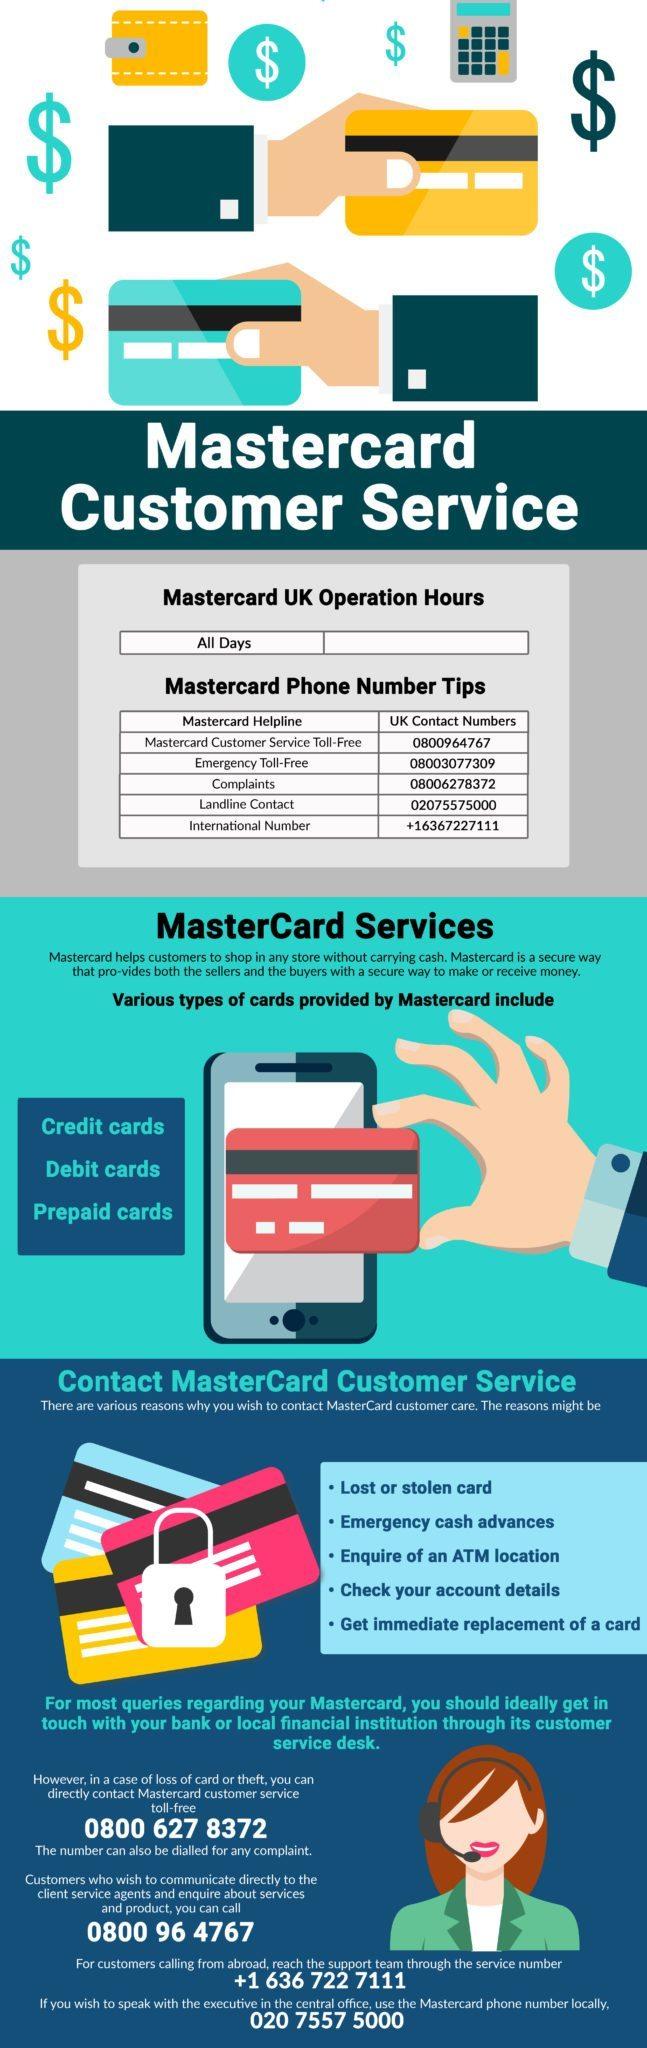 MasterCard Customer Service Number 7 Phone Number